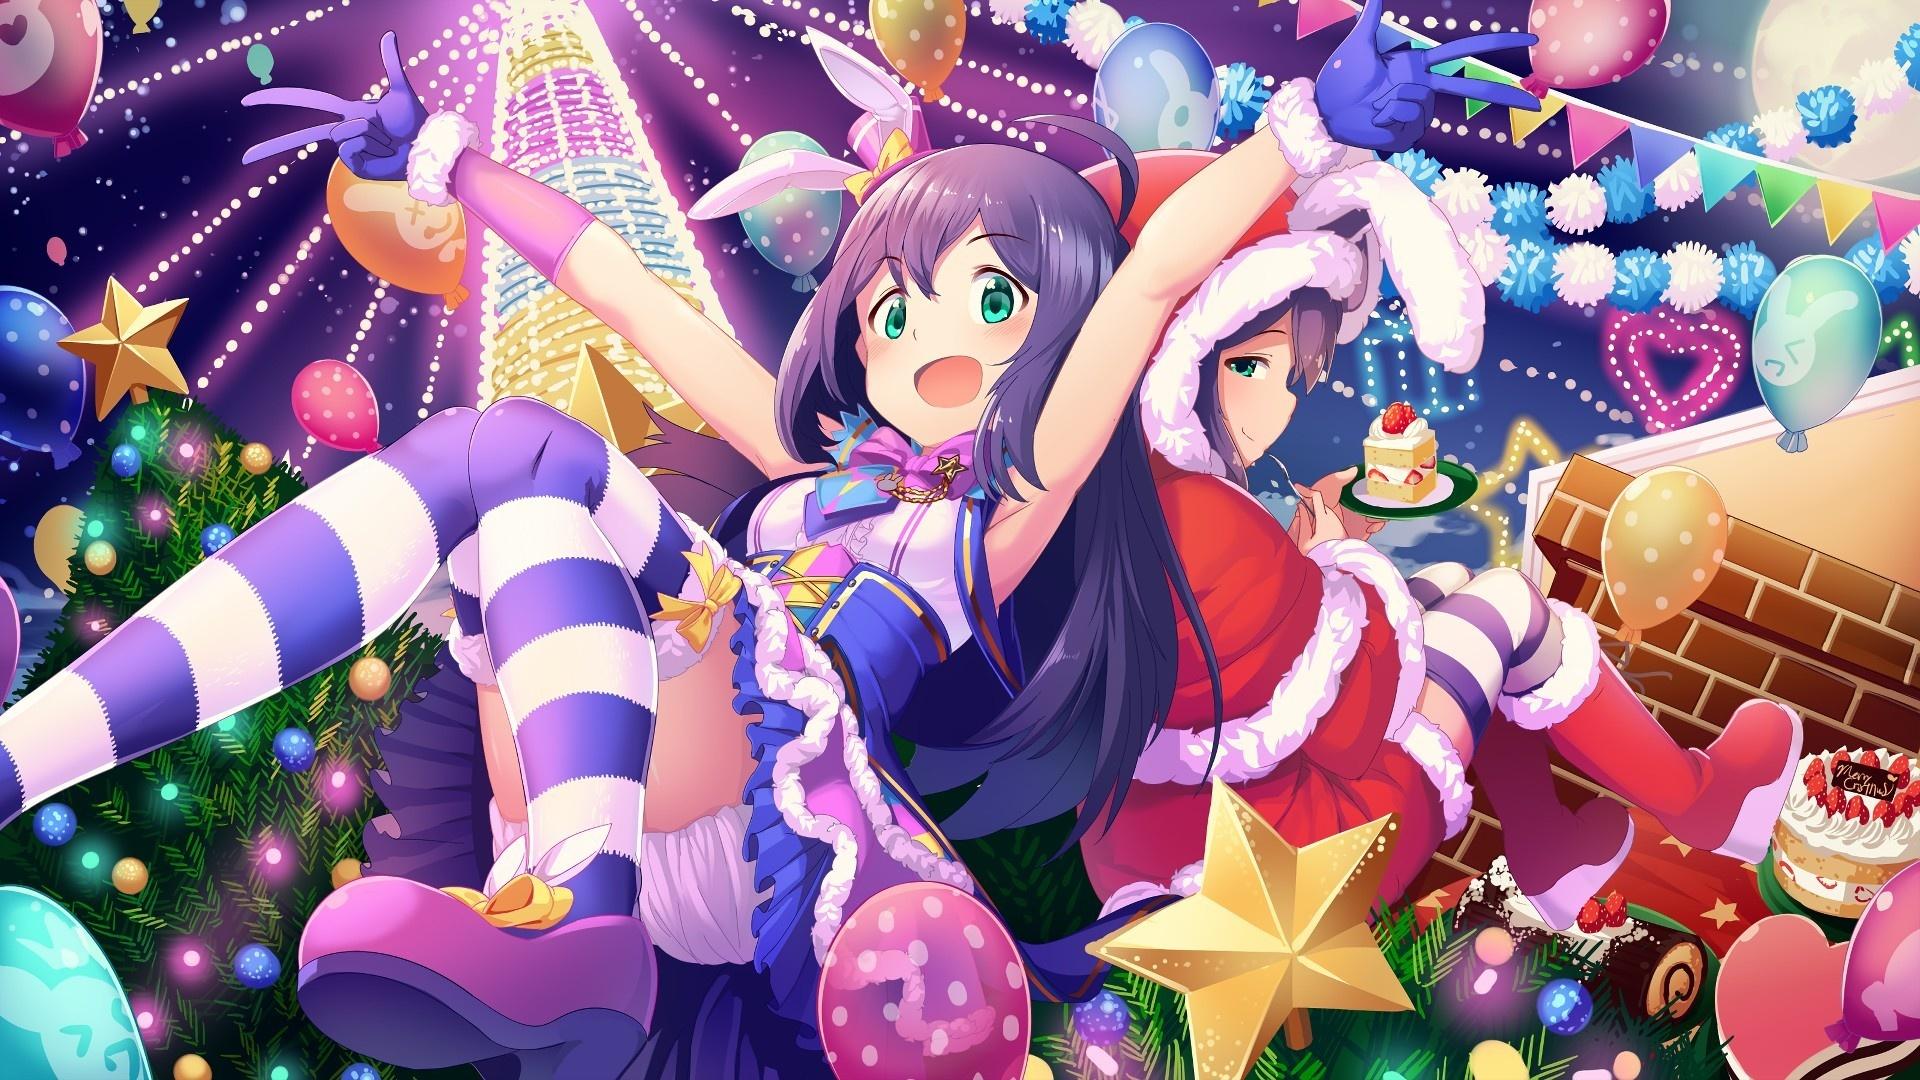 Wallpaper Fun, party, christmas, Anna Mochizuki, The Idolmaster Cinderella Girls